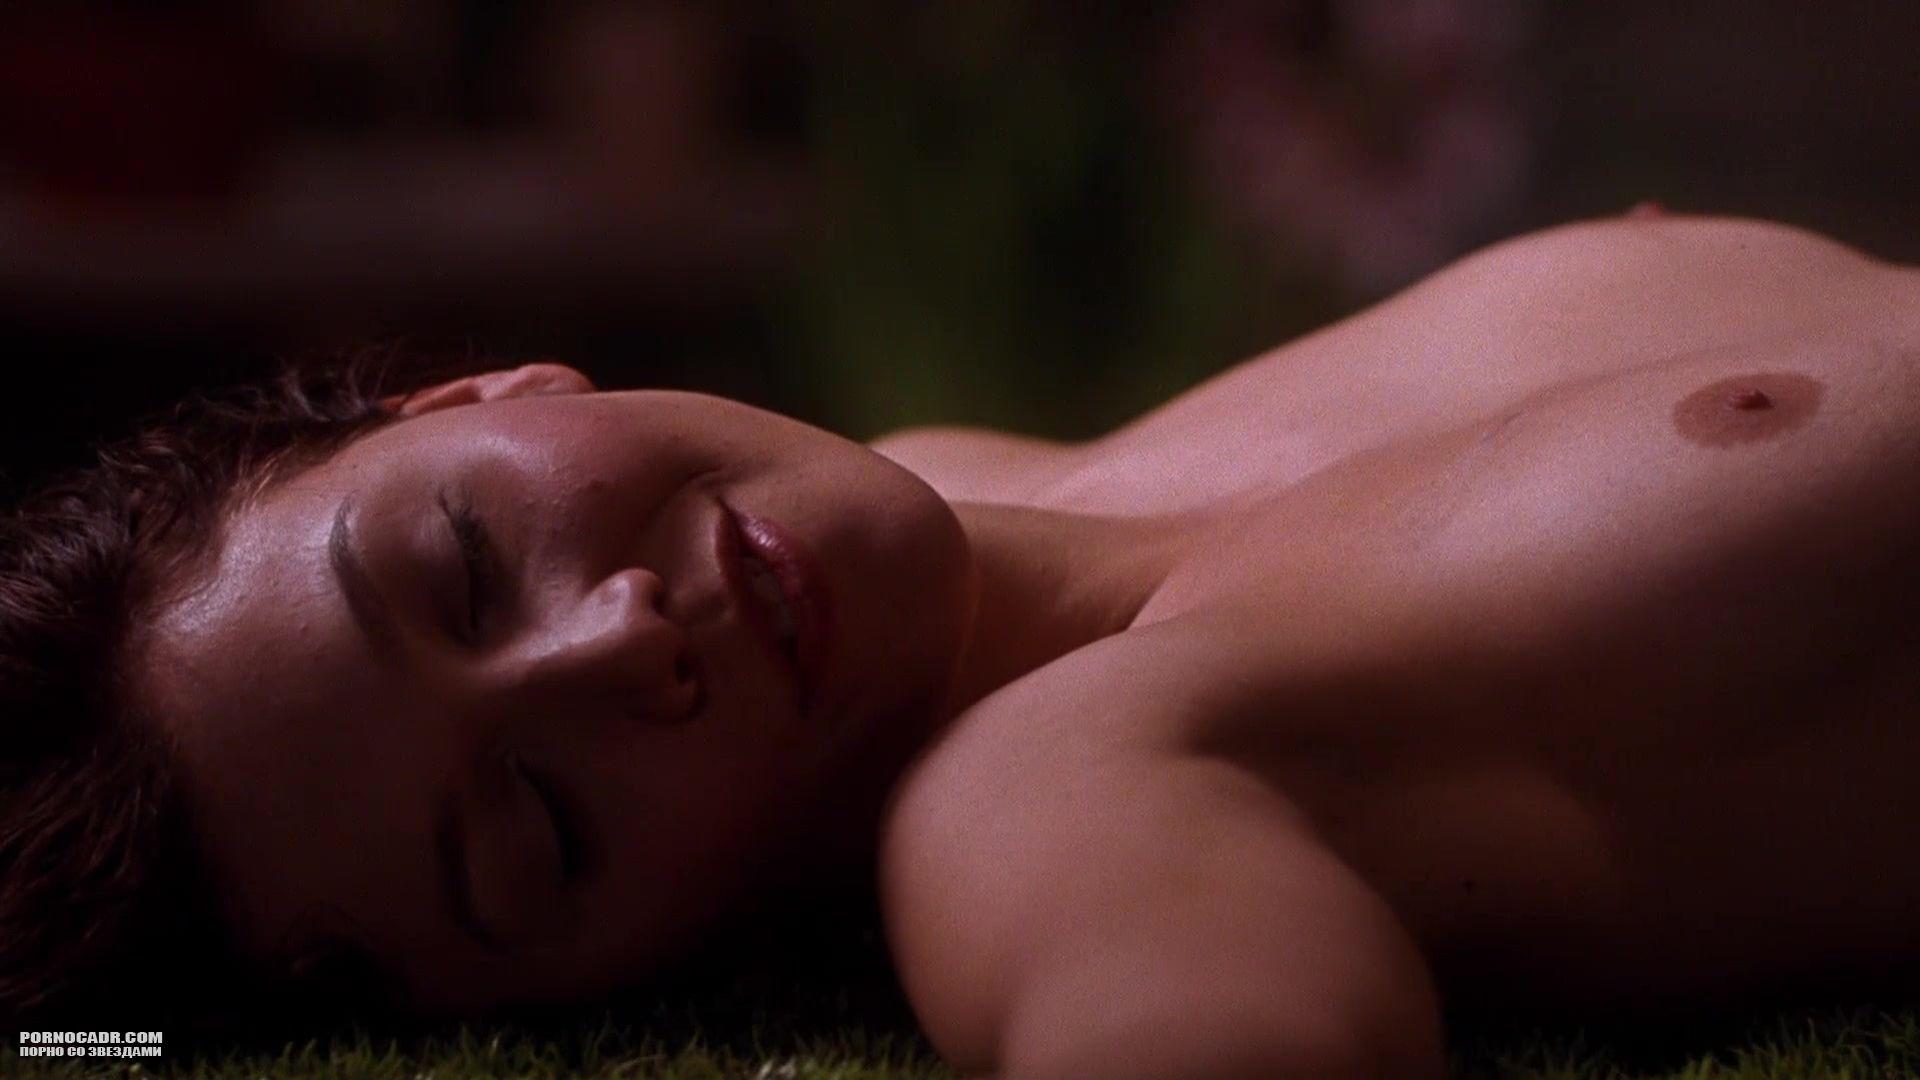 Sex scene welcome, porn hub girls sleeping movies free